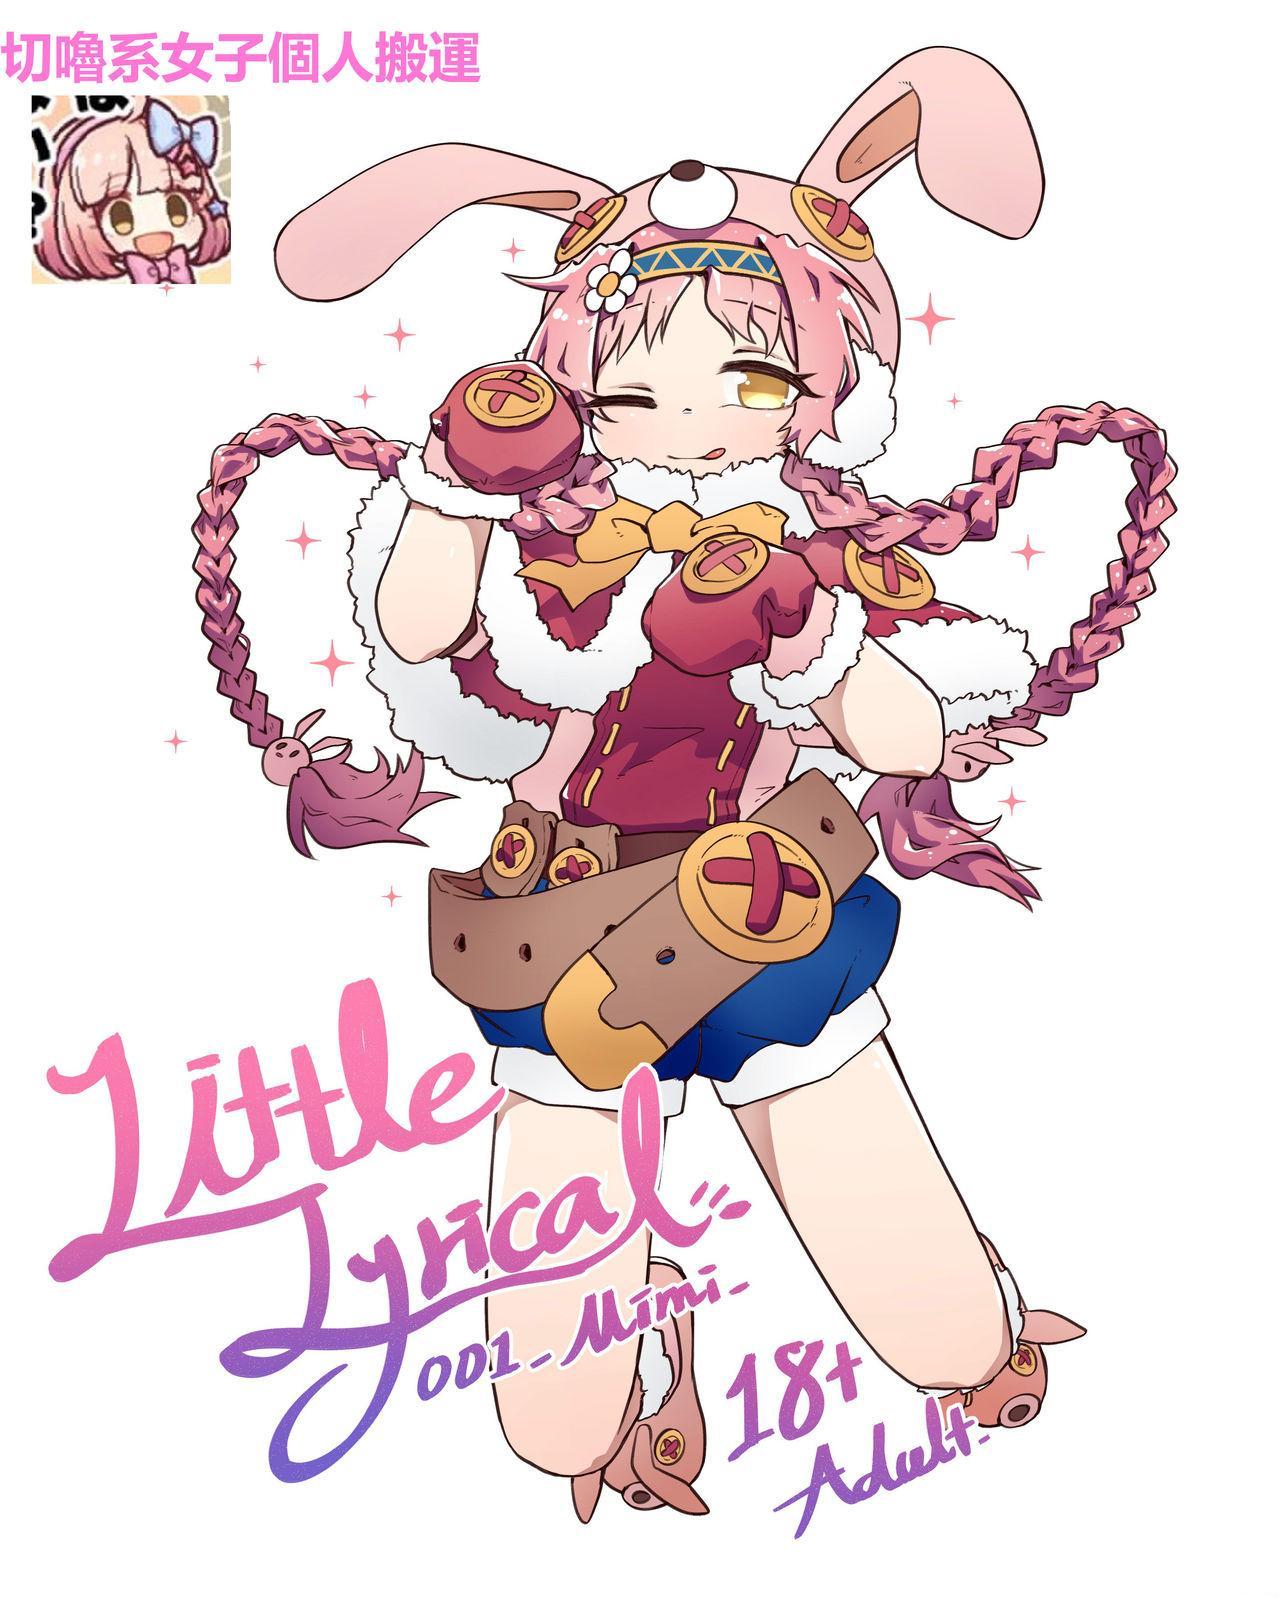 Little Lyrical-MiMi 001 0